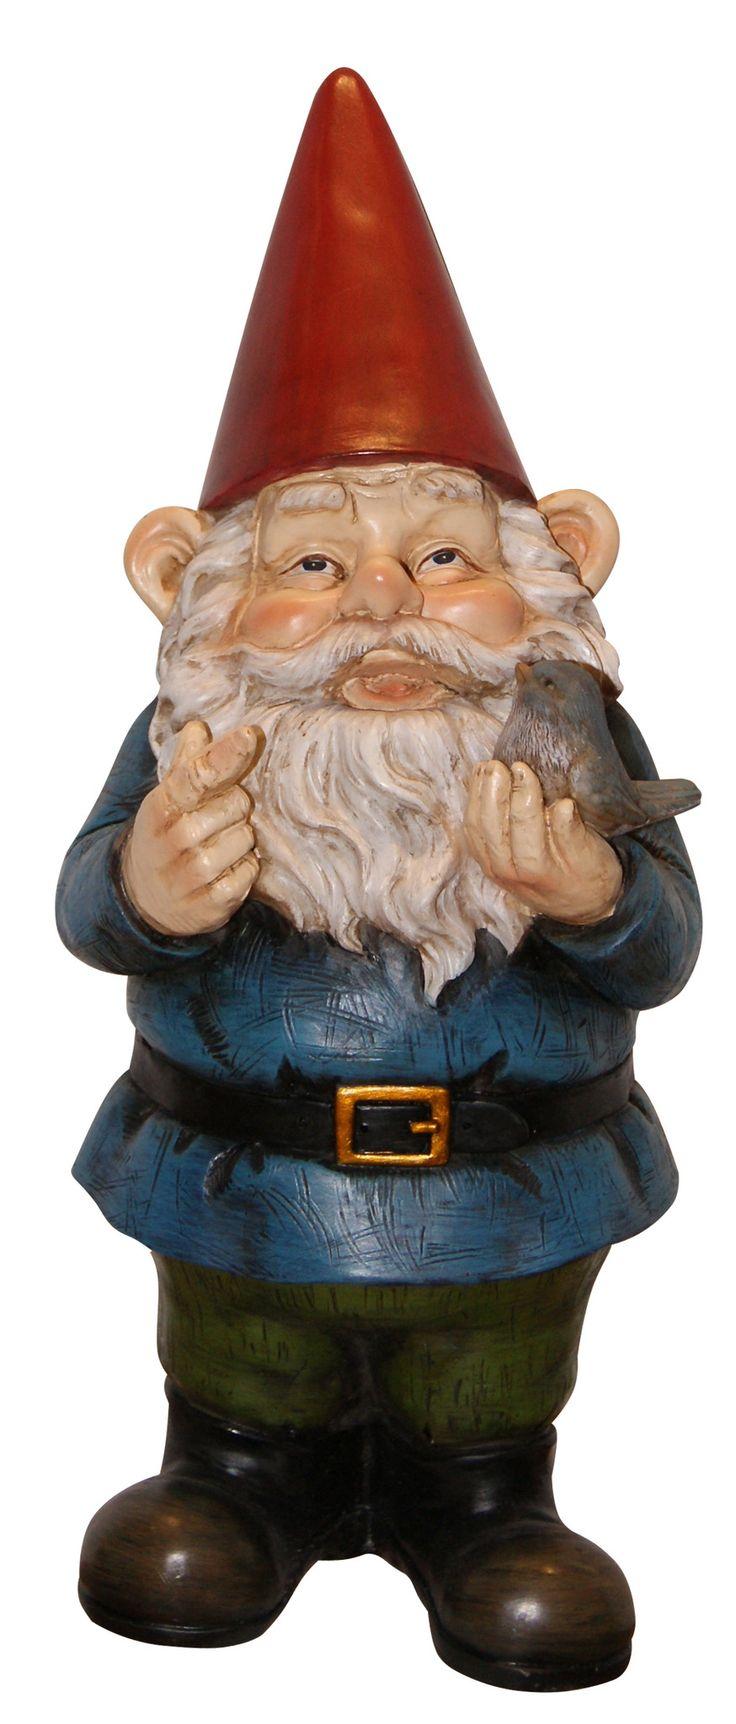 1541 best Gnomes images on Pinterest Gnome garden Fairies